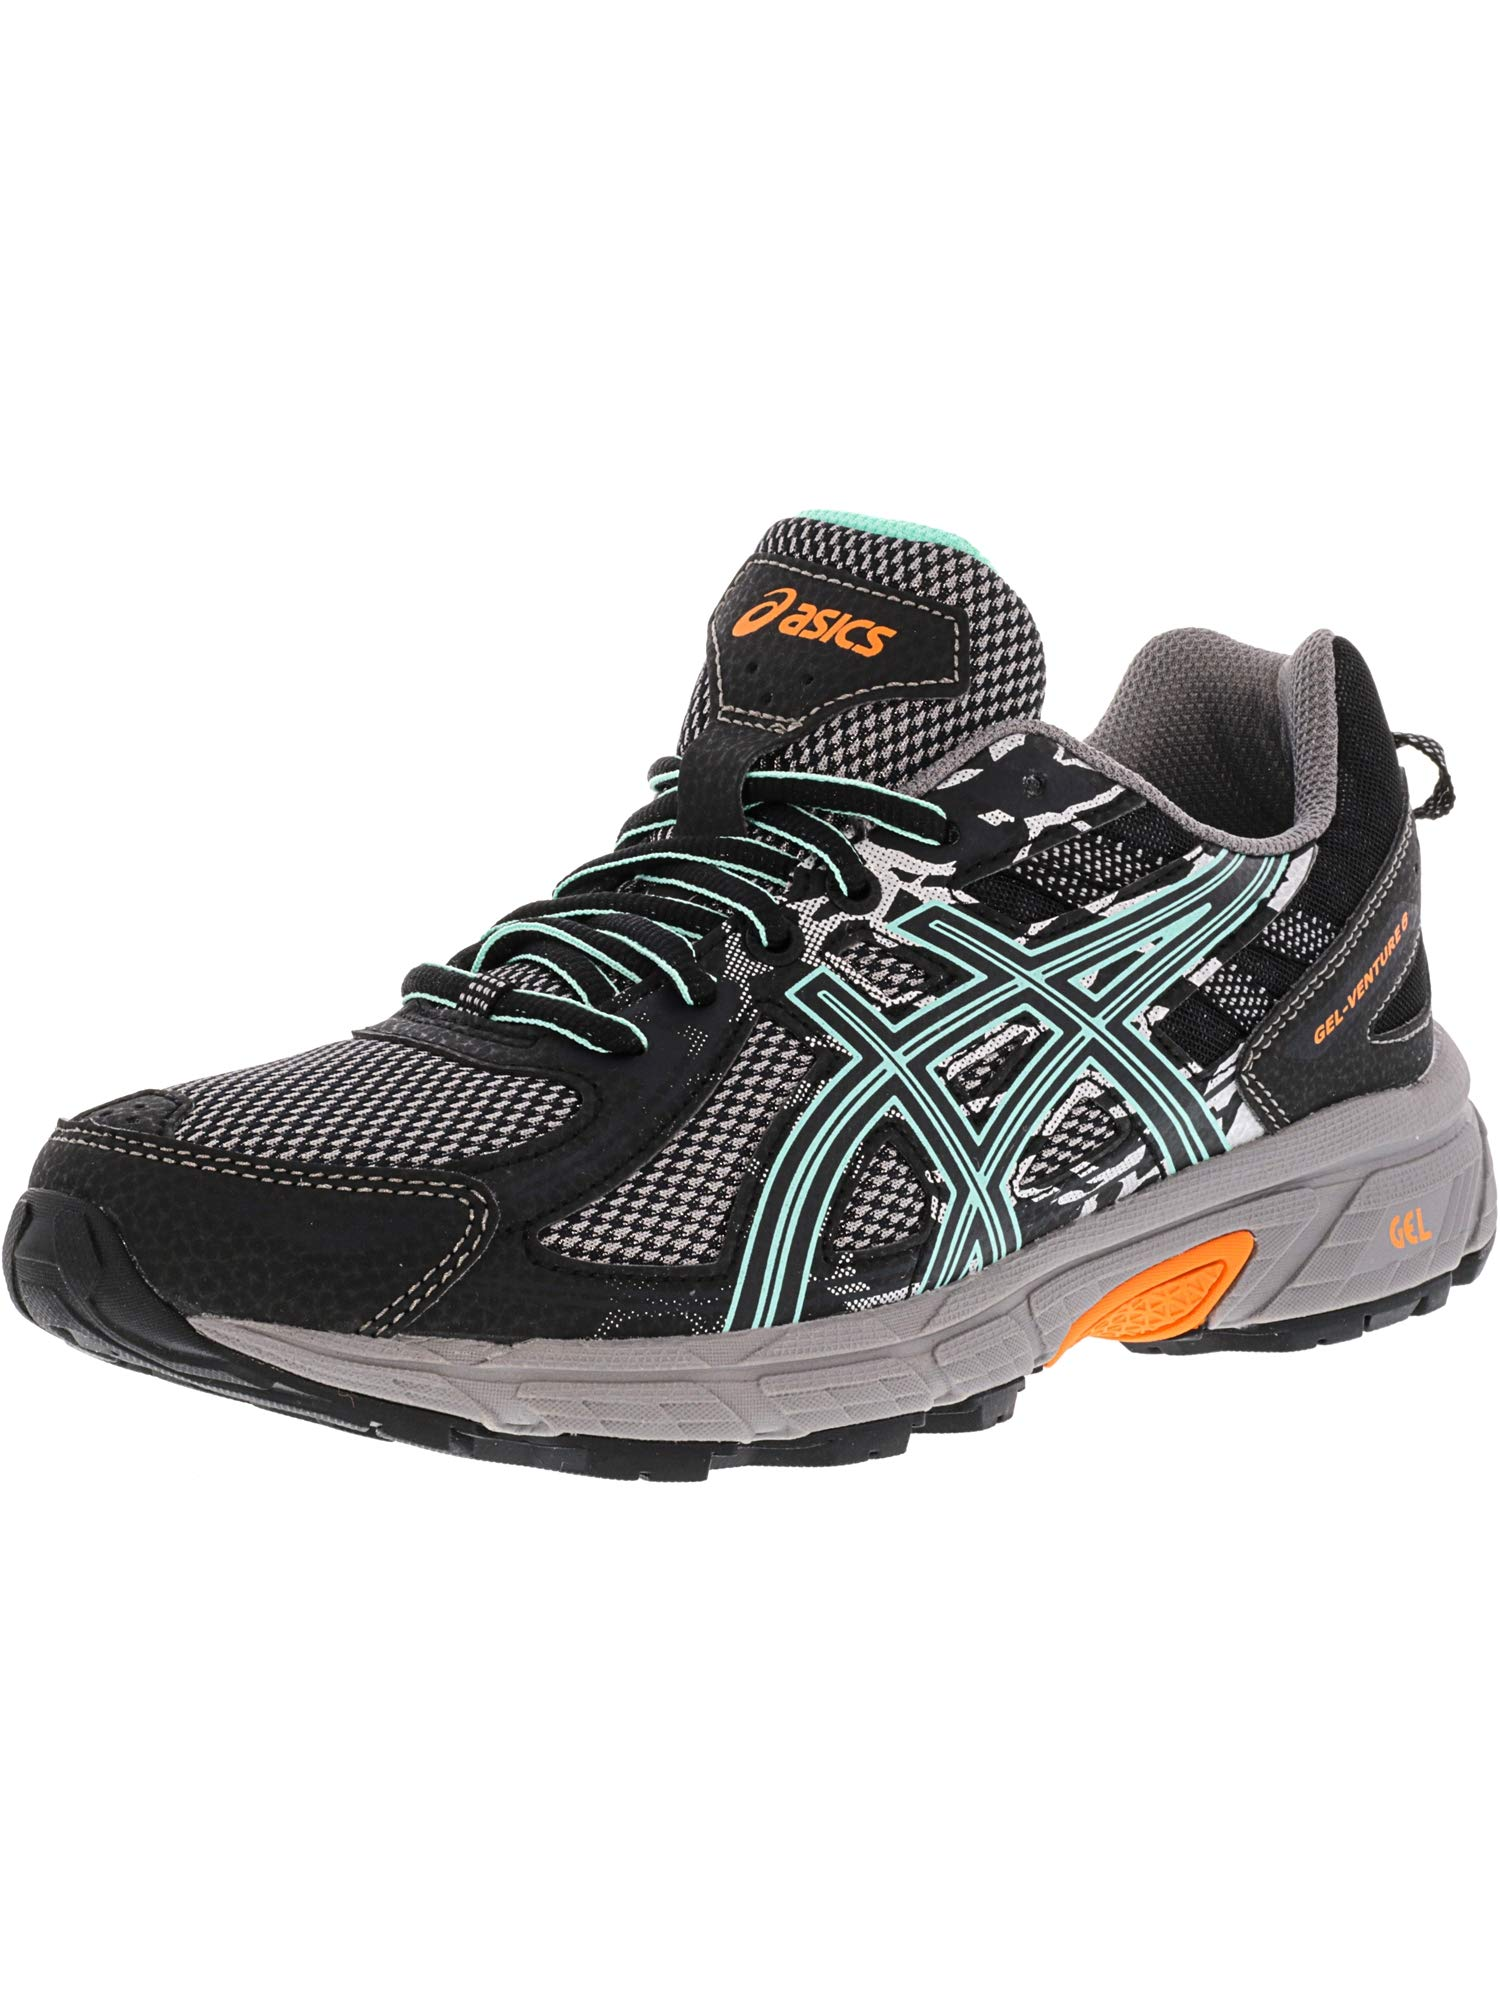 ASICS Women's Gel-Venture 6 Running Shoe, Black/Ice Green/Orange, 10 M US